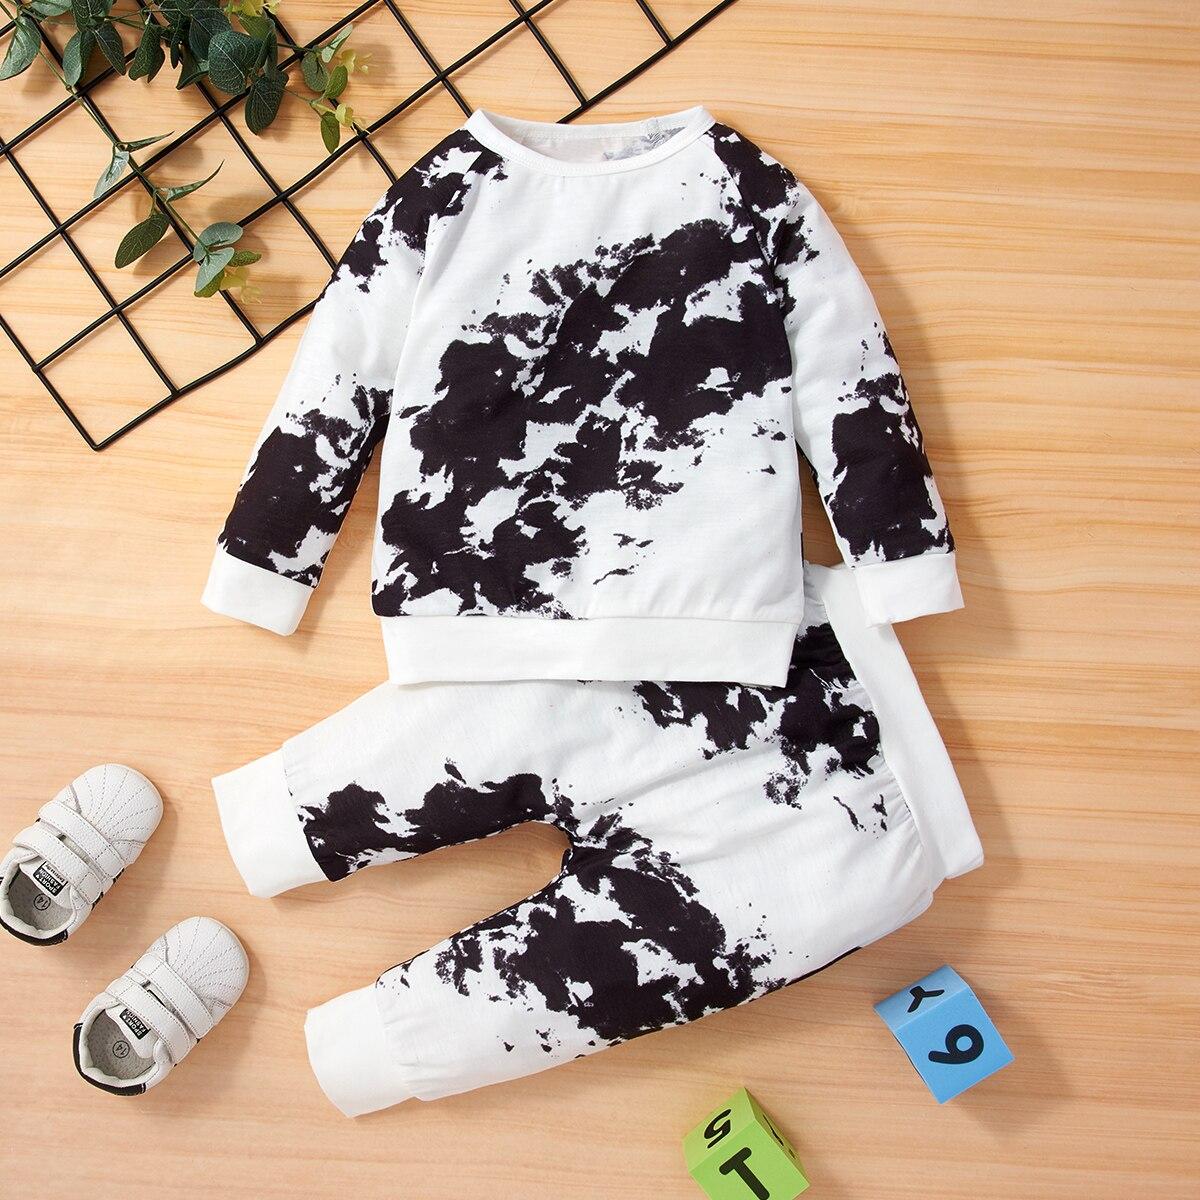 Unisex Baby Clothes Long Sleeve Top and Paints 2 Pcs Set Newbron Clothing Sweatshirt Suit Infant Sof